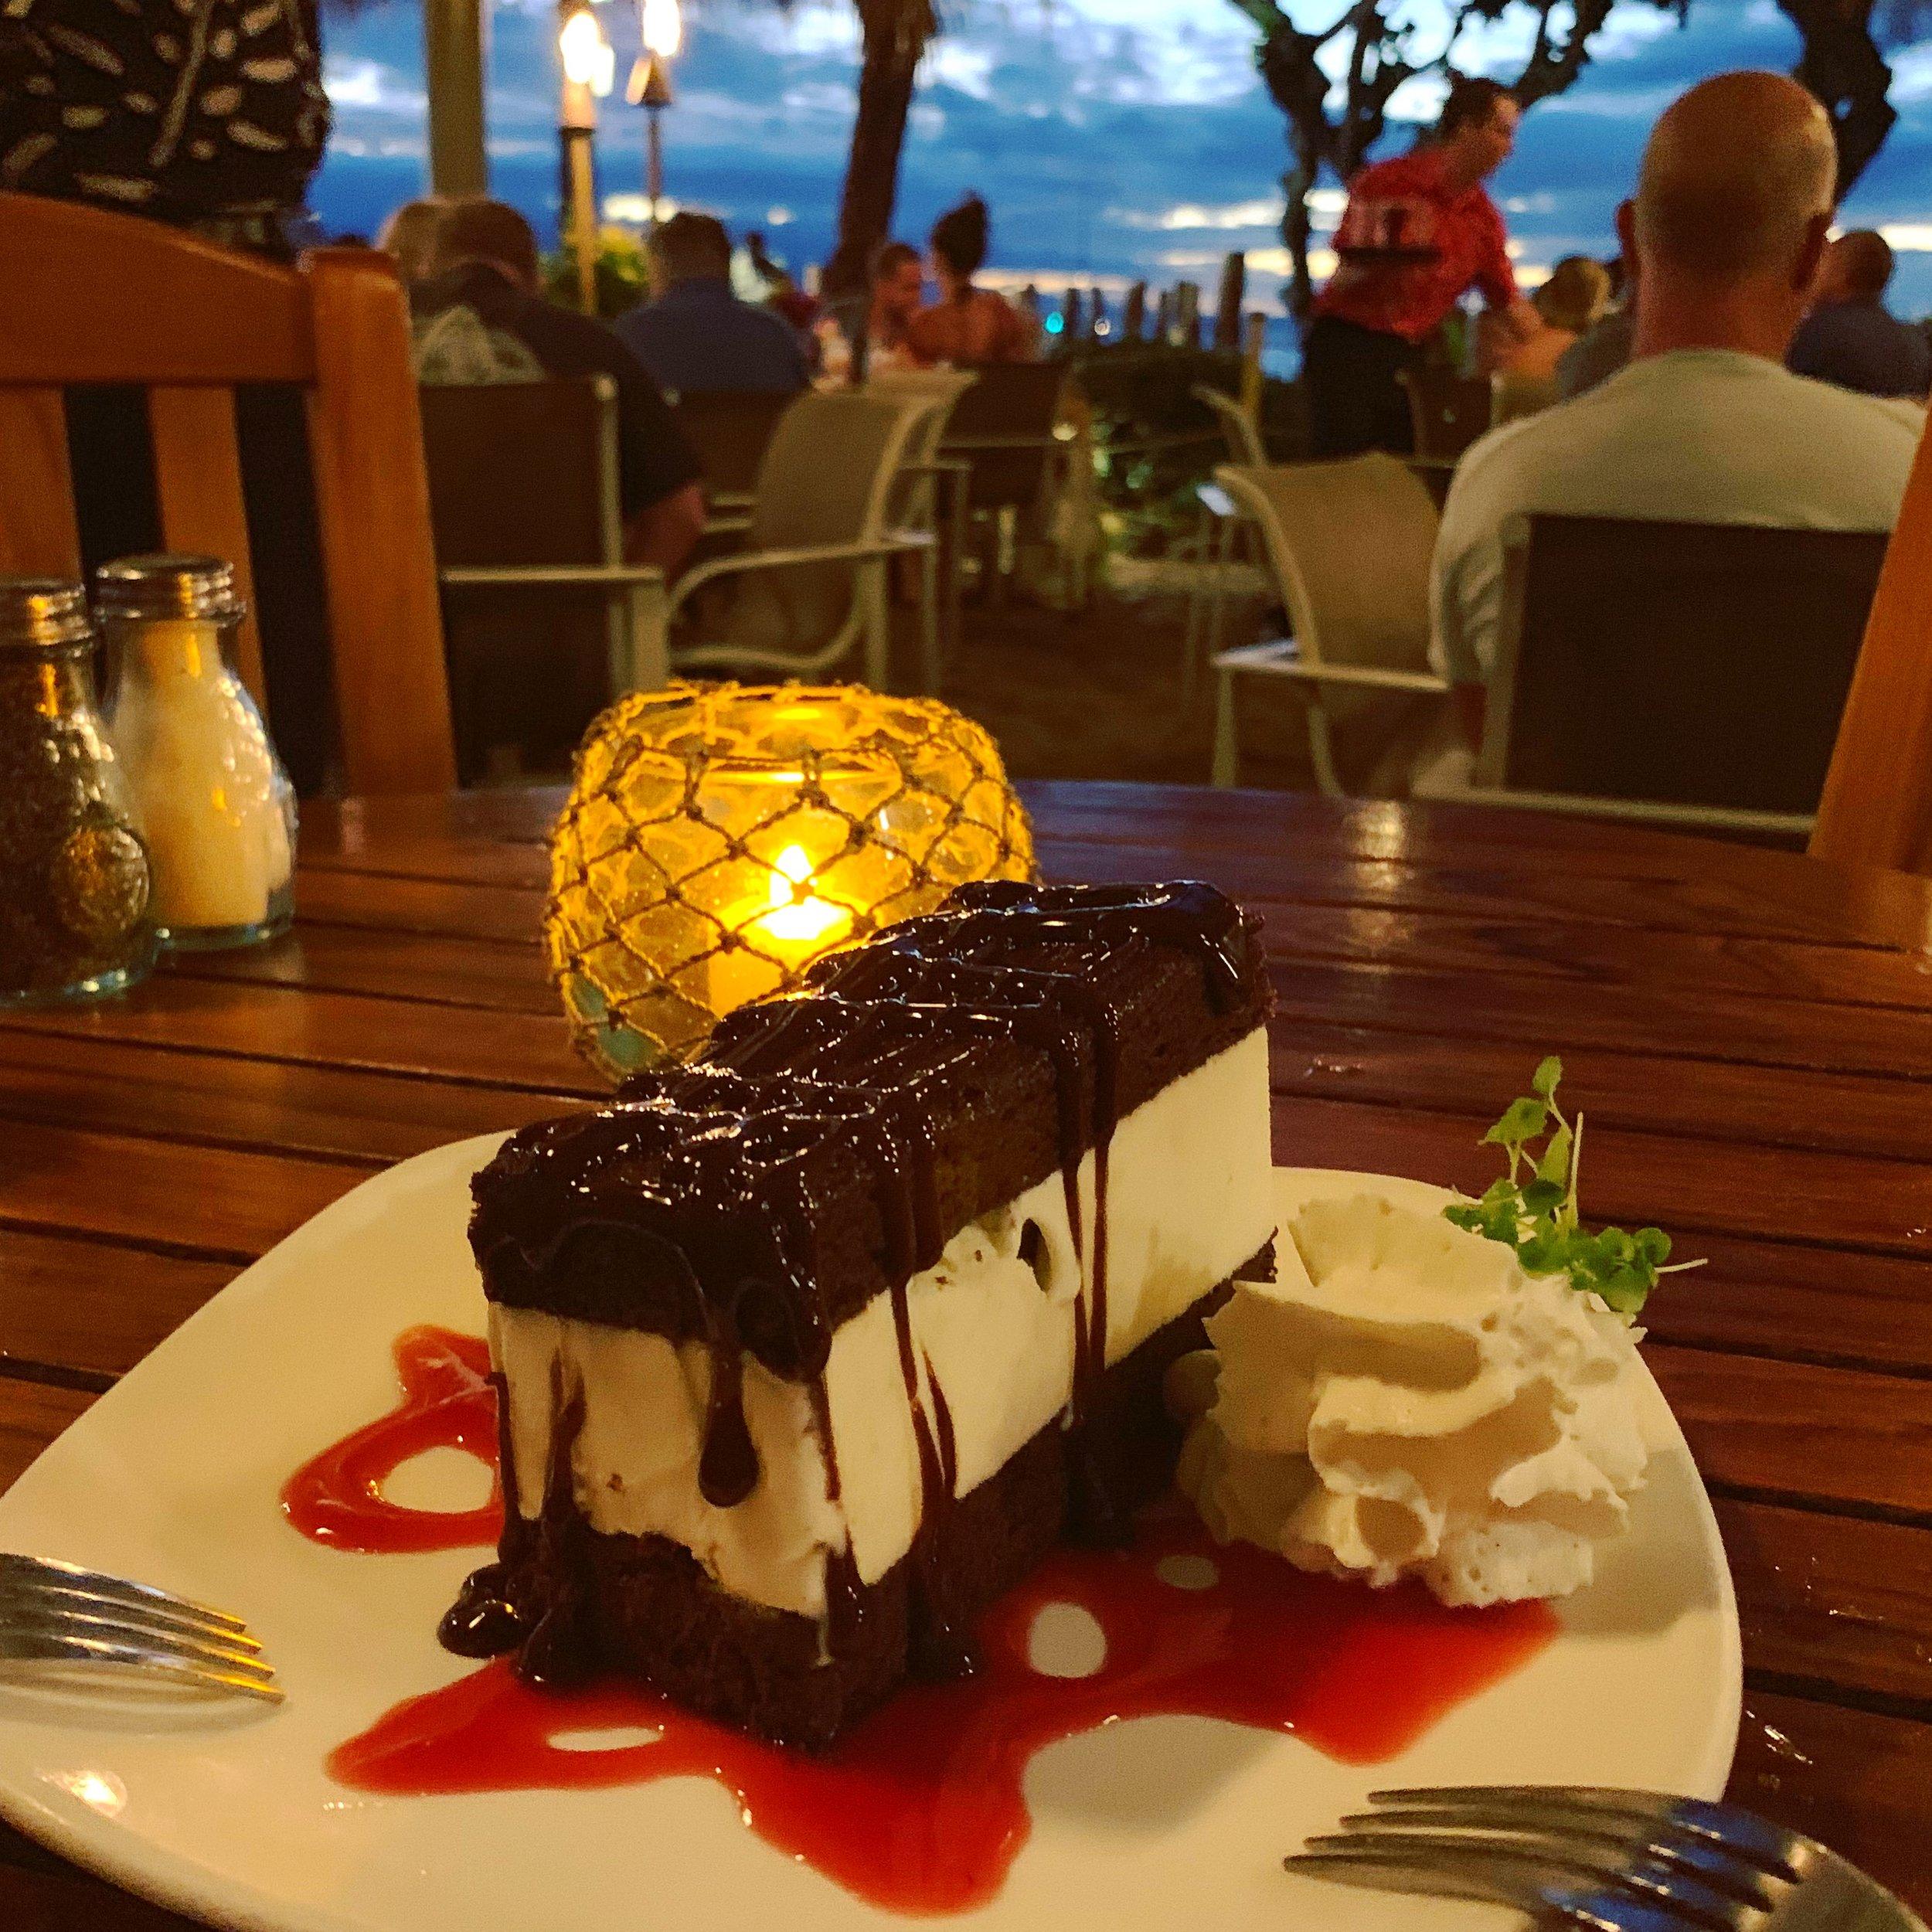 Maui, Hawaii Hula Grill and Barefoot Bar - Ice Cream Sandwich